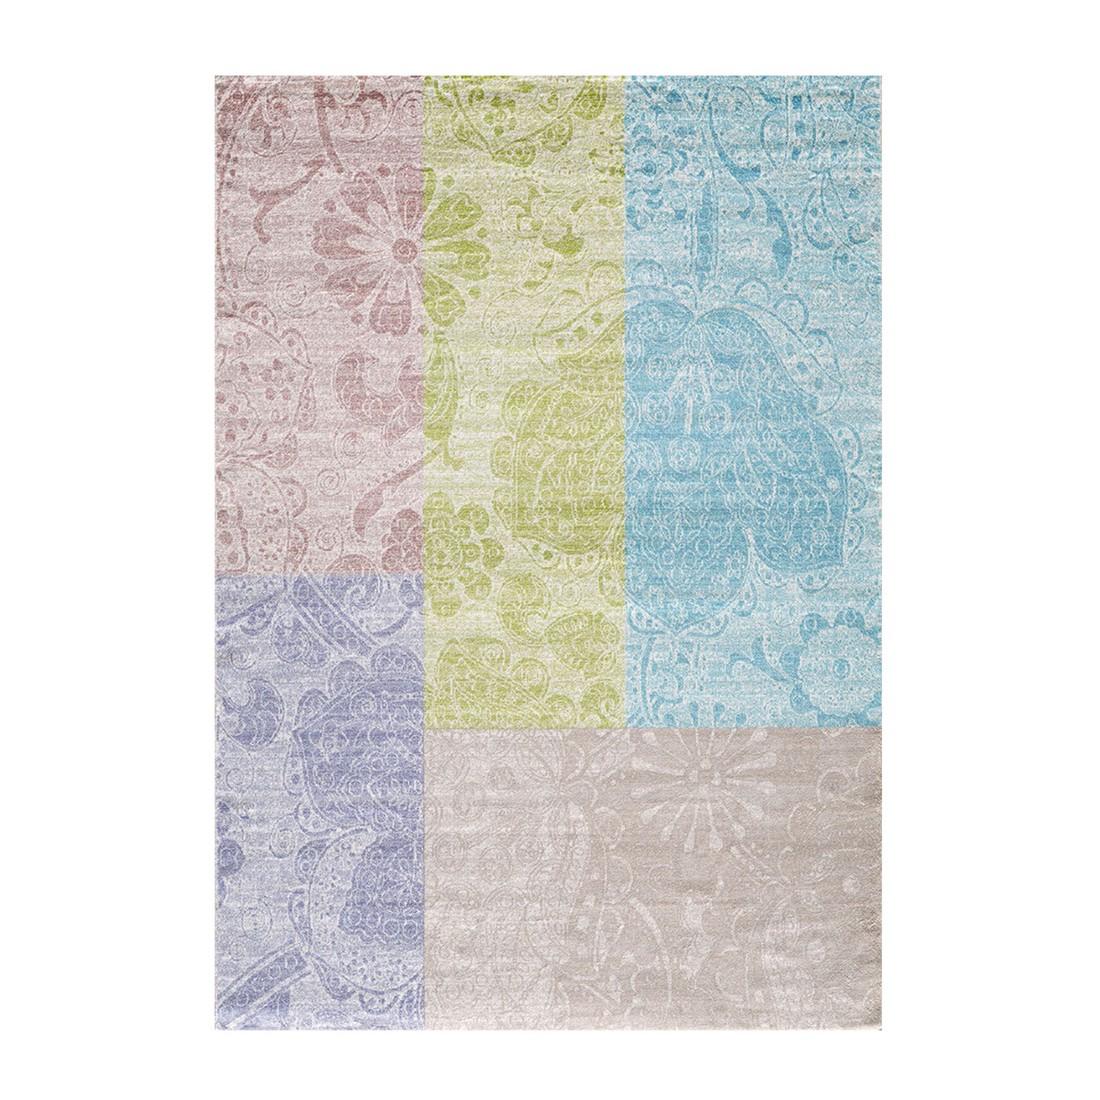 Teppich Sorbe Lolipop – Multicolor – Maße: 160 x 230 cm, Kayoom günstig kaufen